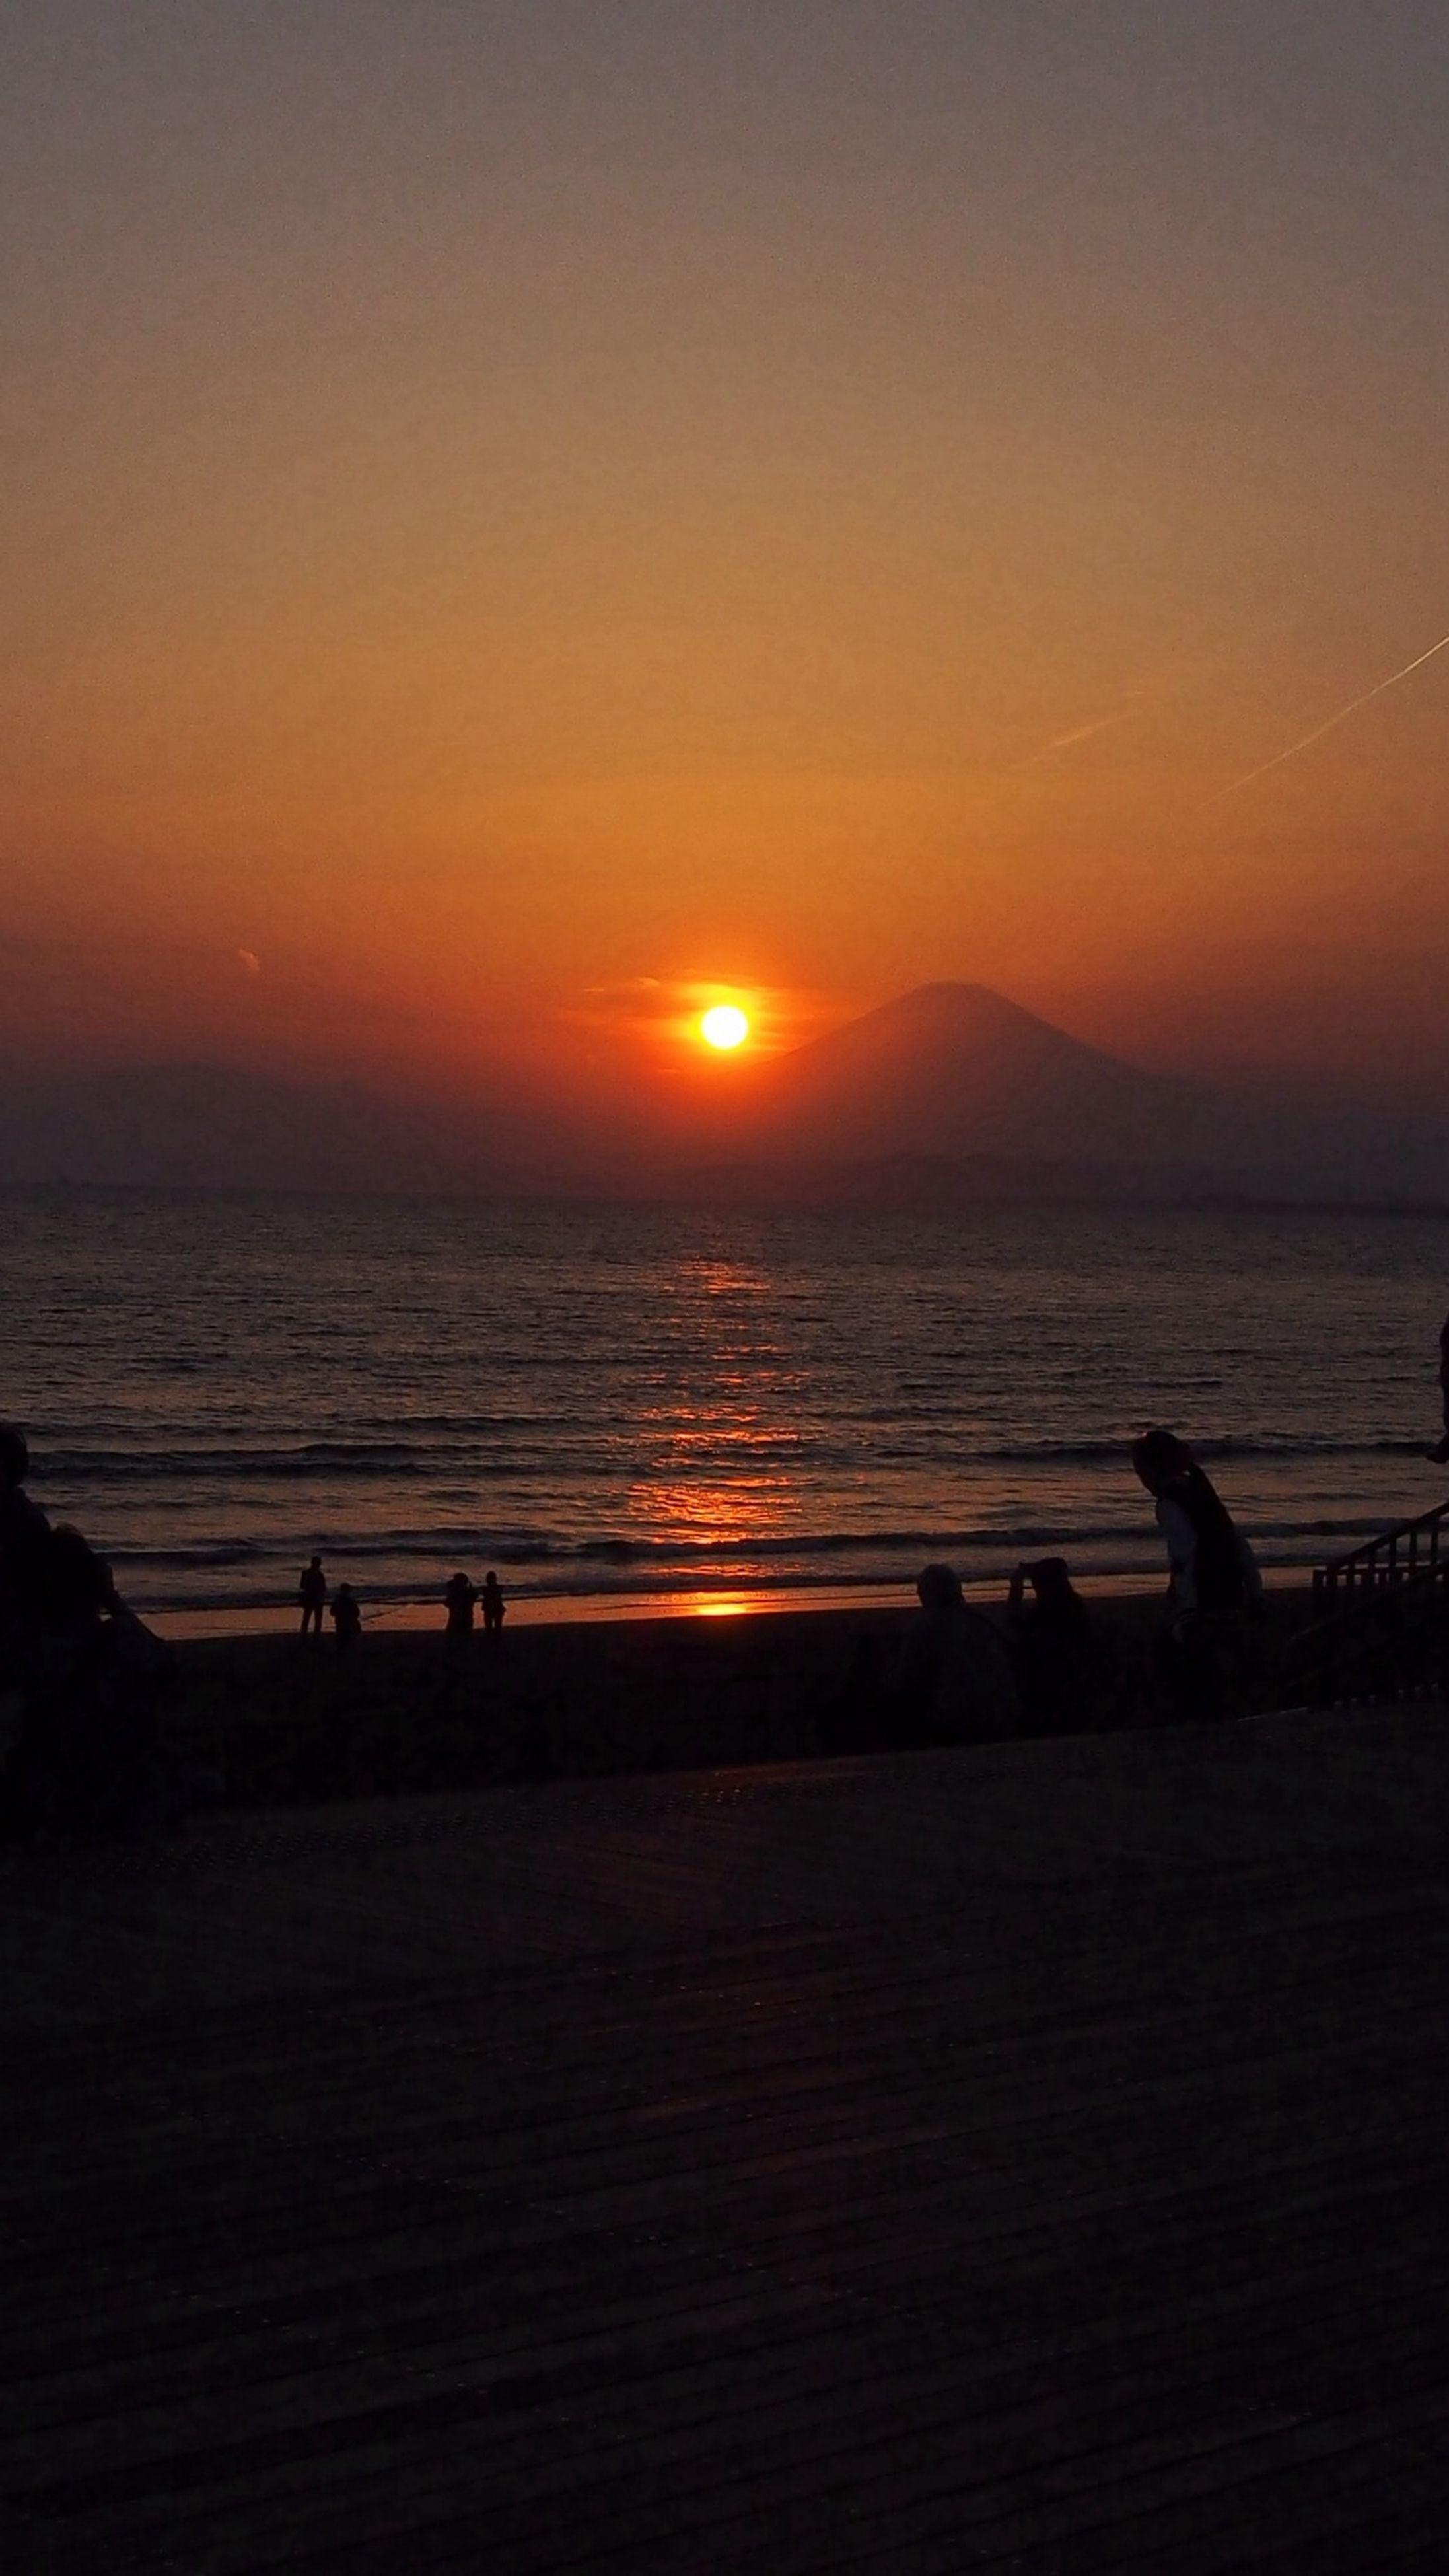 sunset, sea, water, sun, horizon over water, orange color, scenics, beach, tranquil scene, beauty in nature, tranquility, silhouette, idyllic, sky, shore, nature, reflection, sunlight, remote, coastline